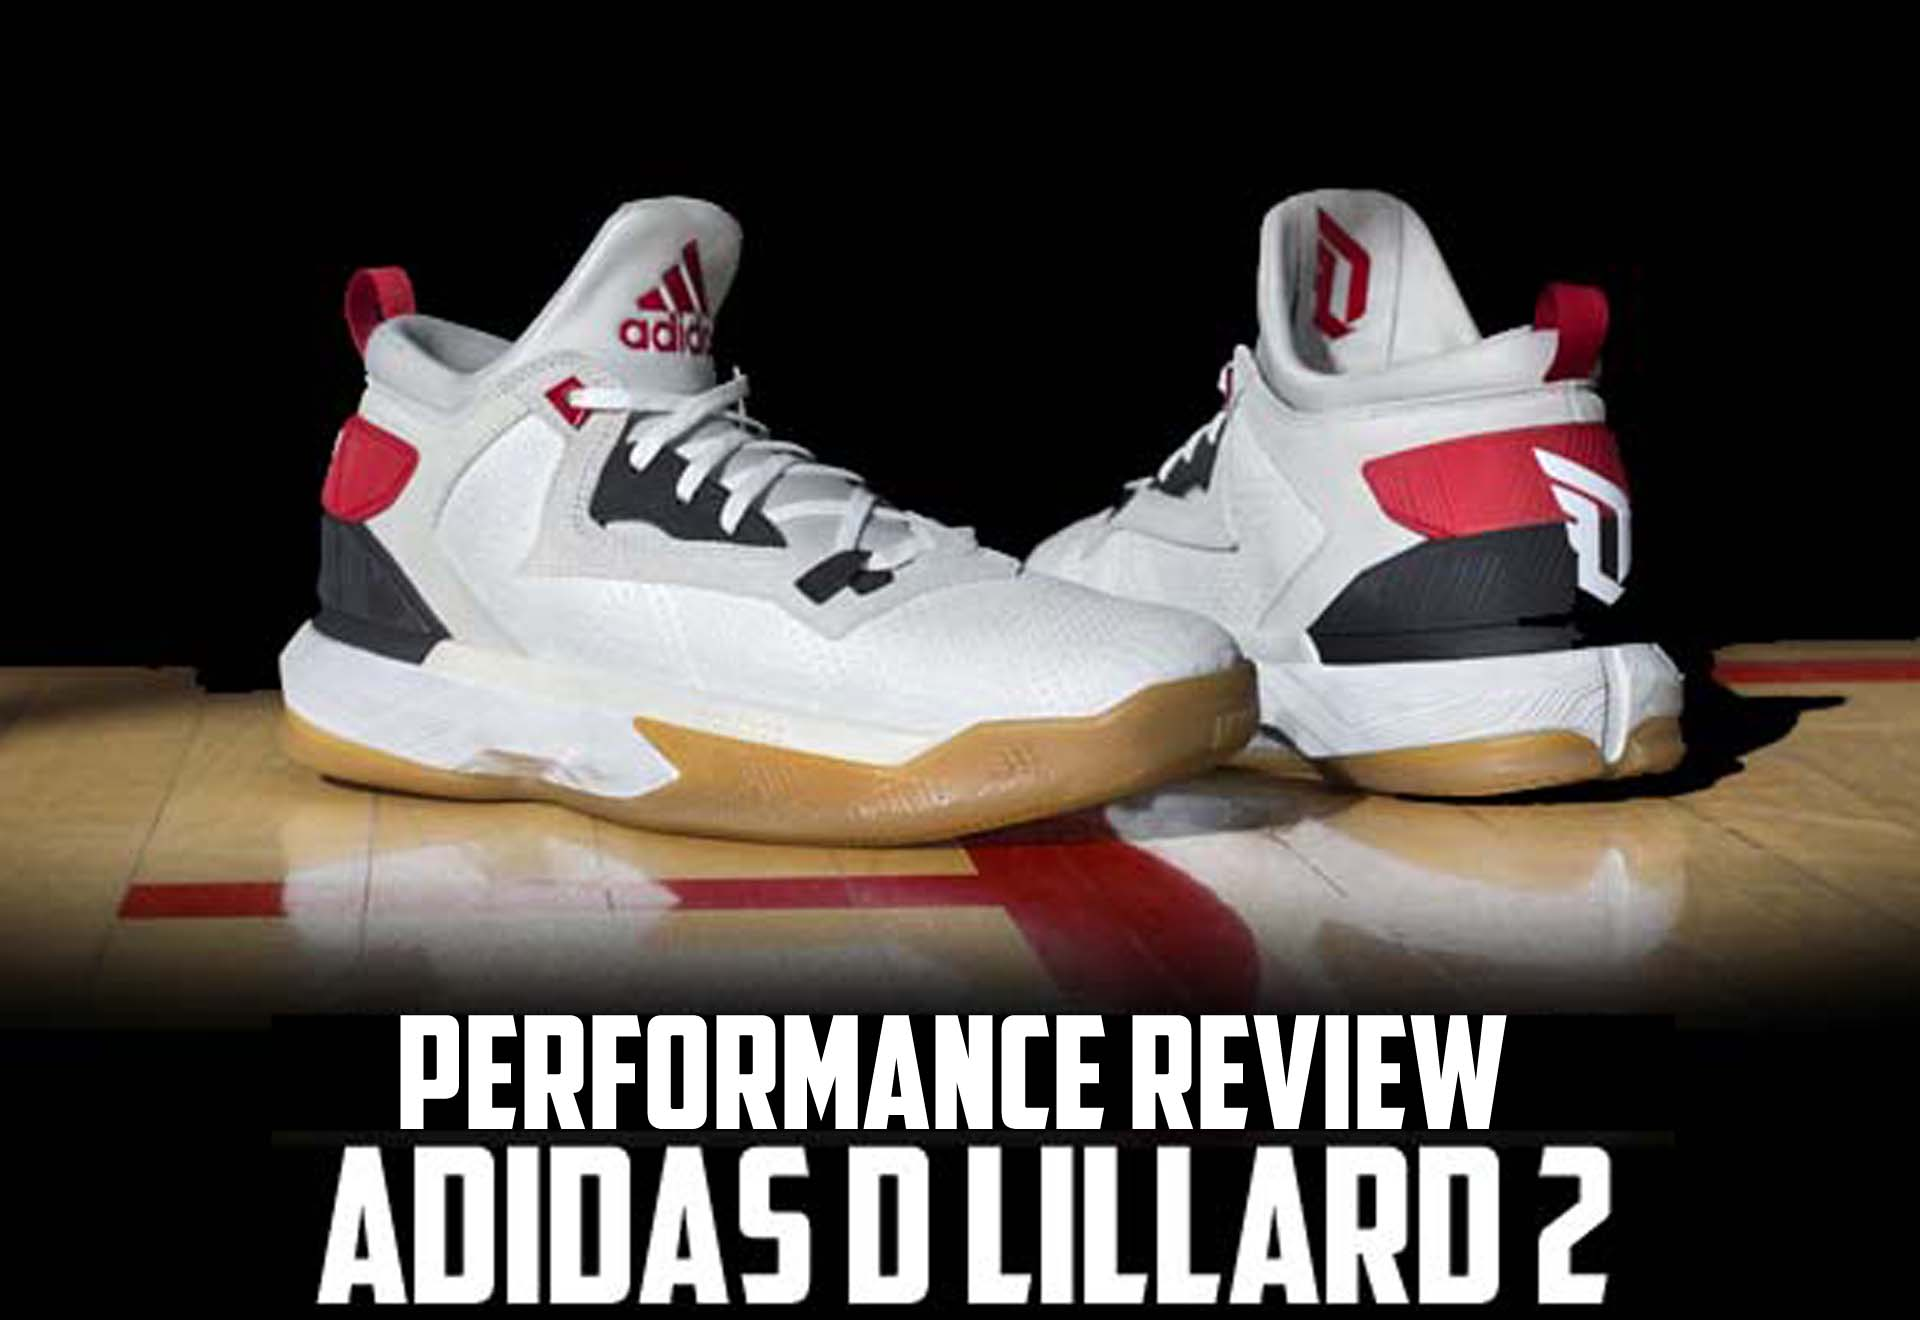 adidas d lillard 2 performance review main